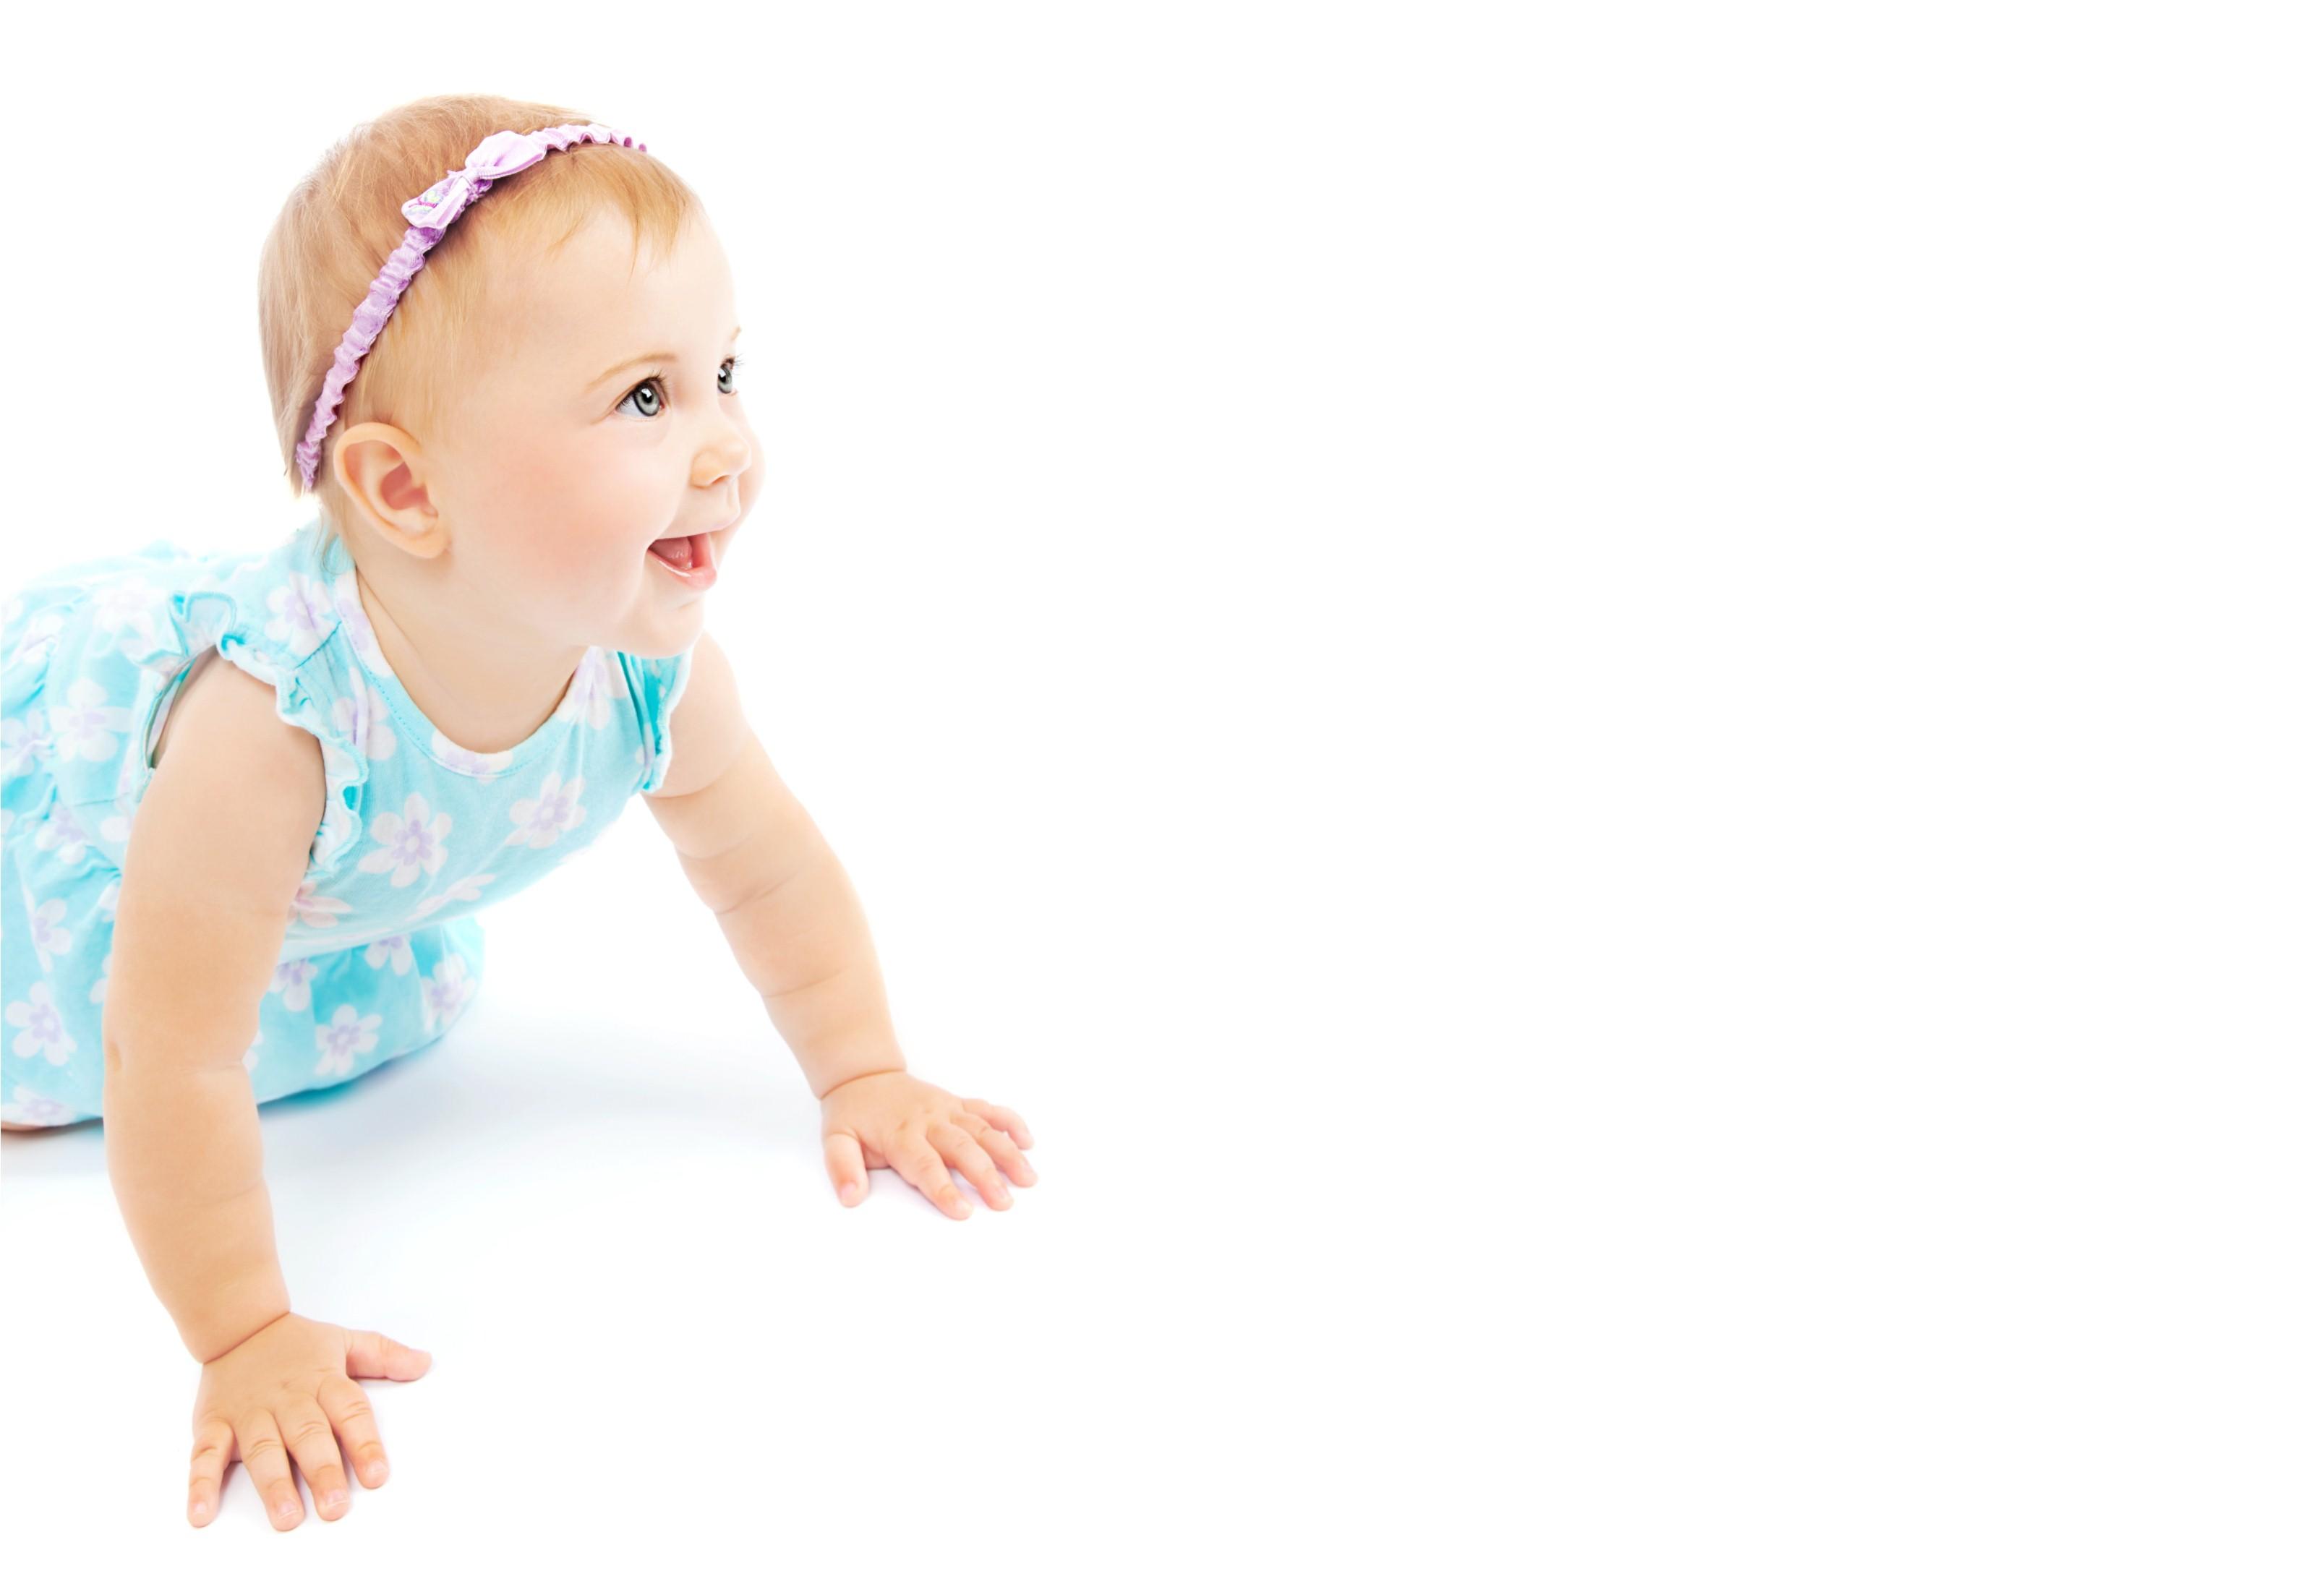 MEDIUM SIZED REGIONAL CHILDCARE BUSINESS